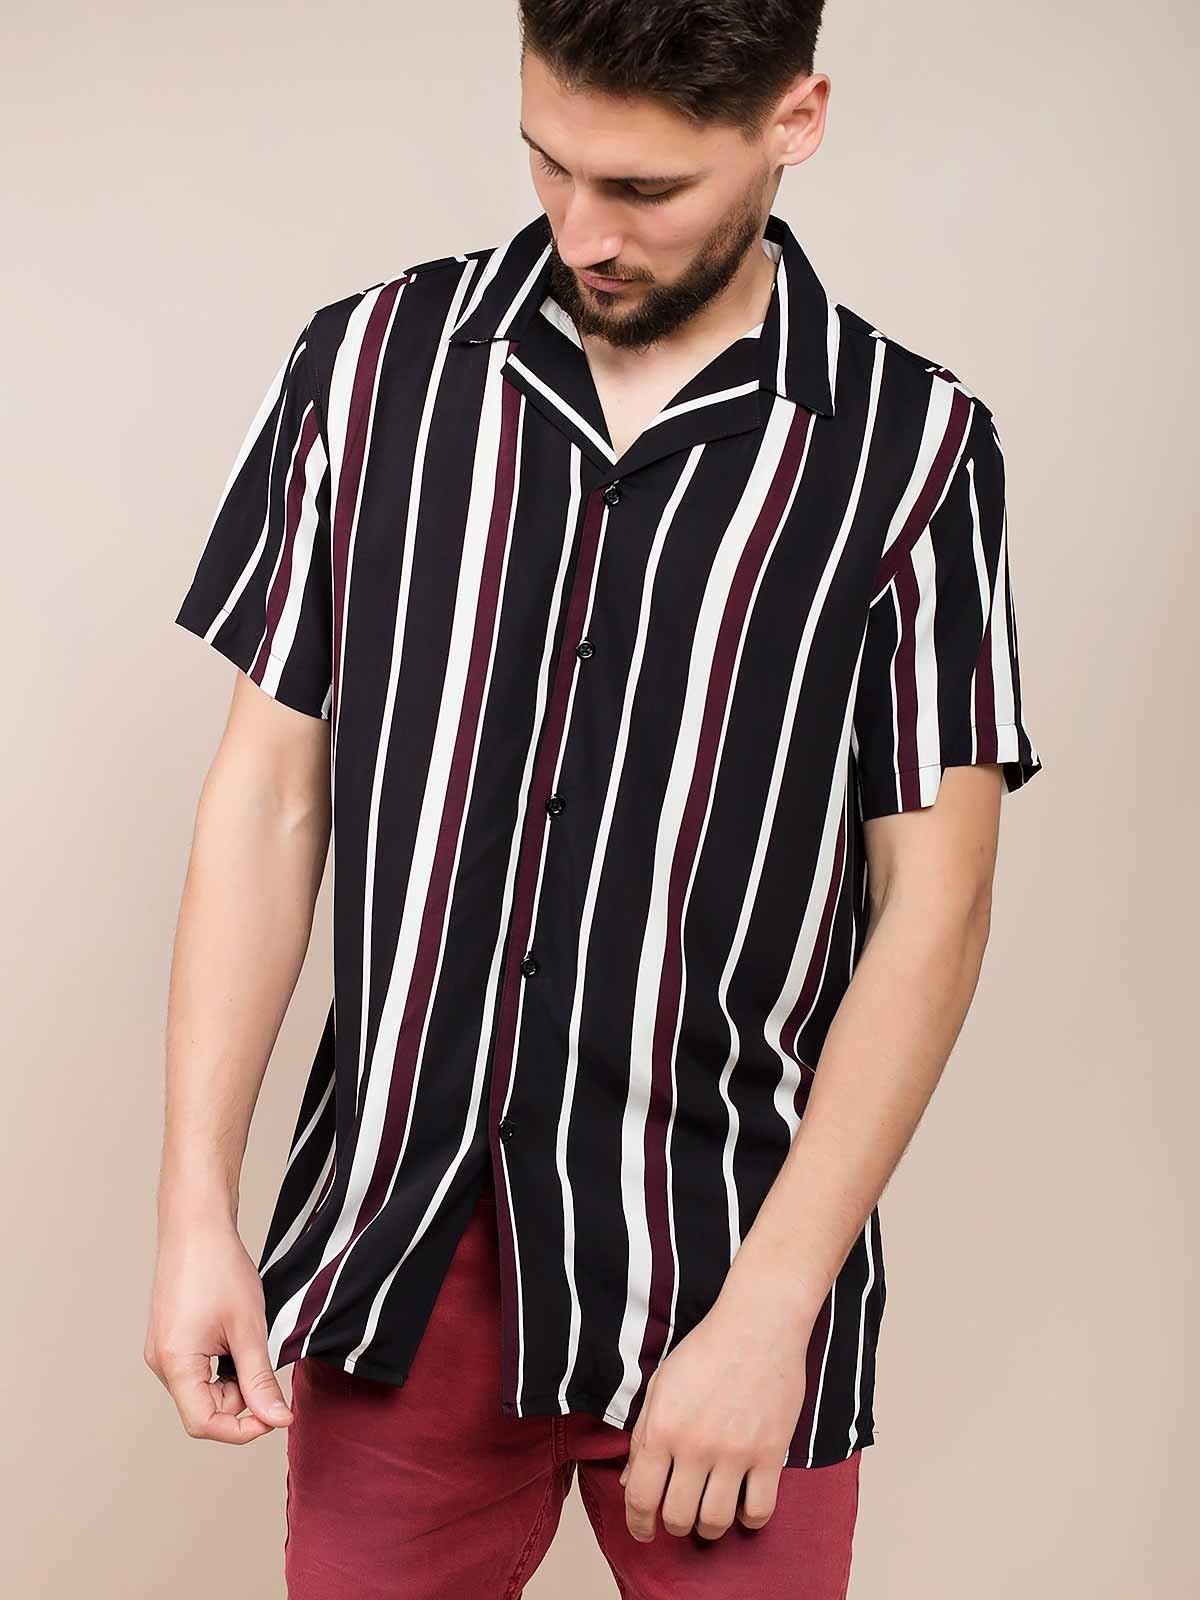 Camisa riscas preto e bordeaux